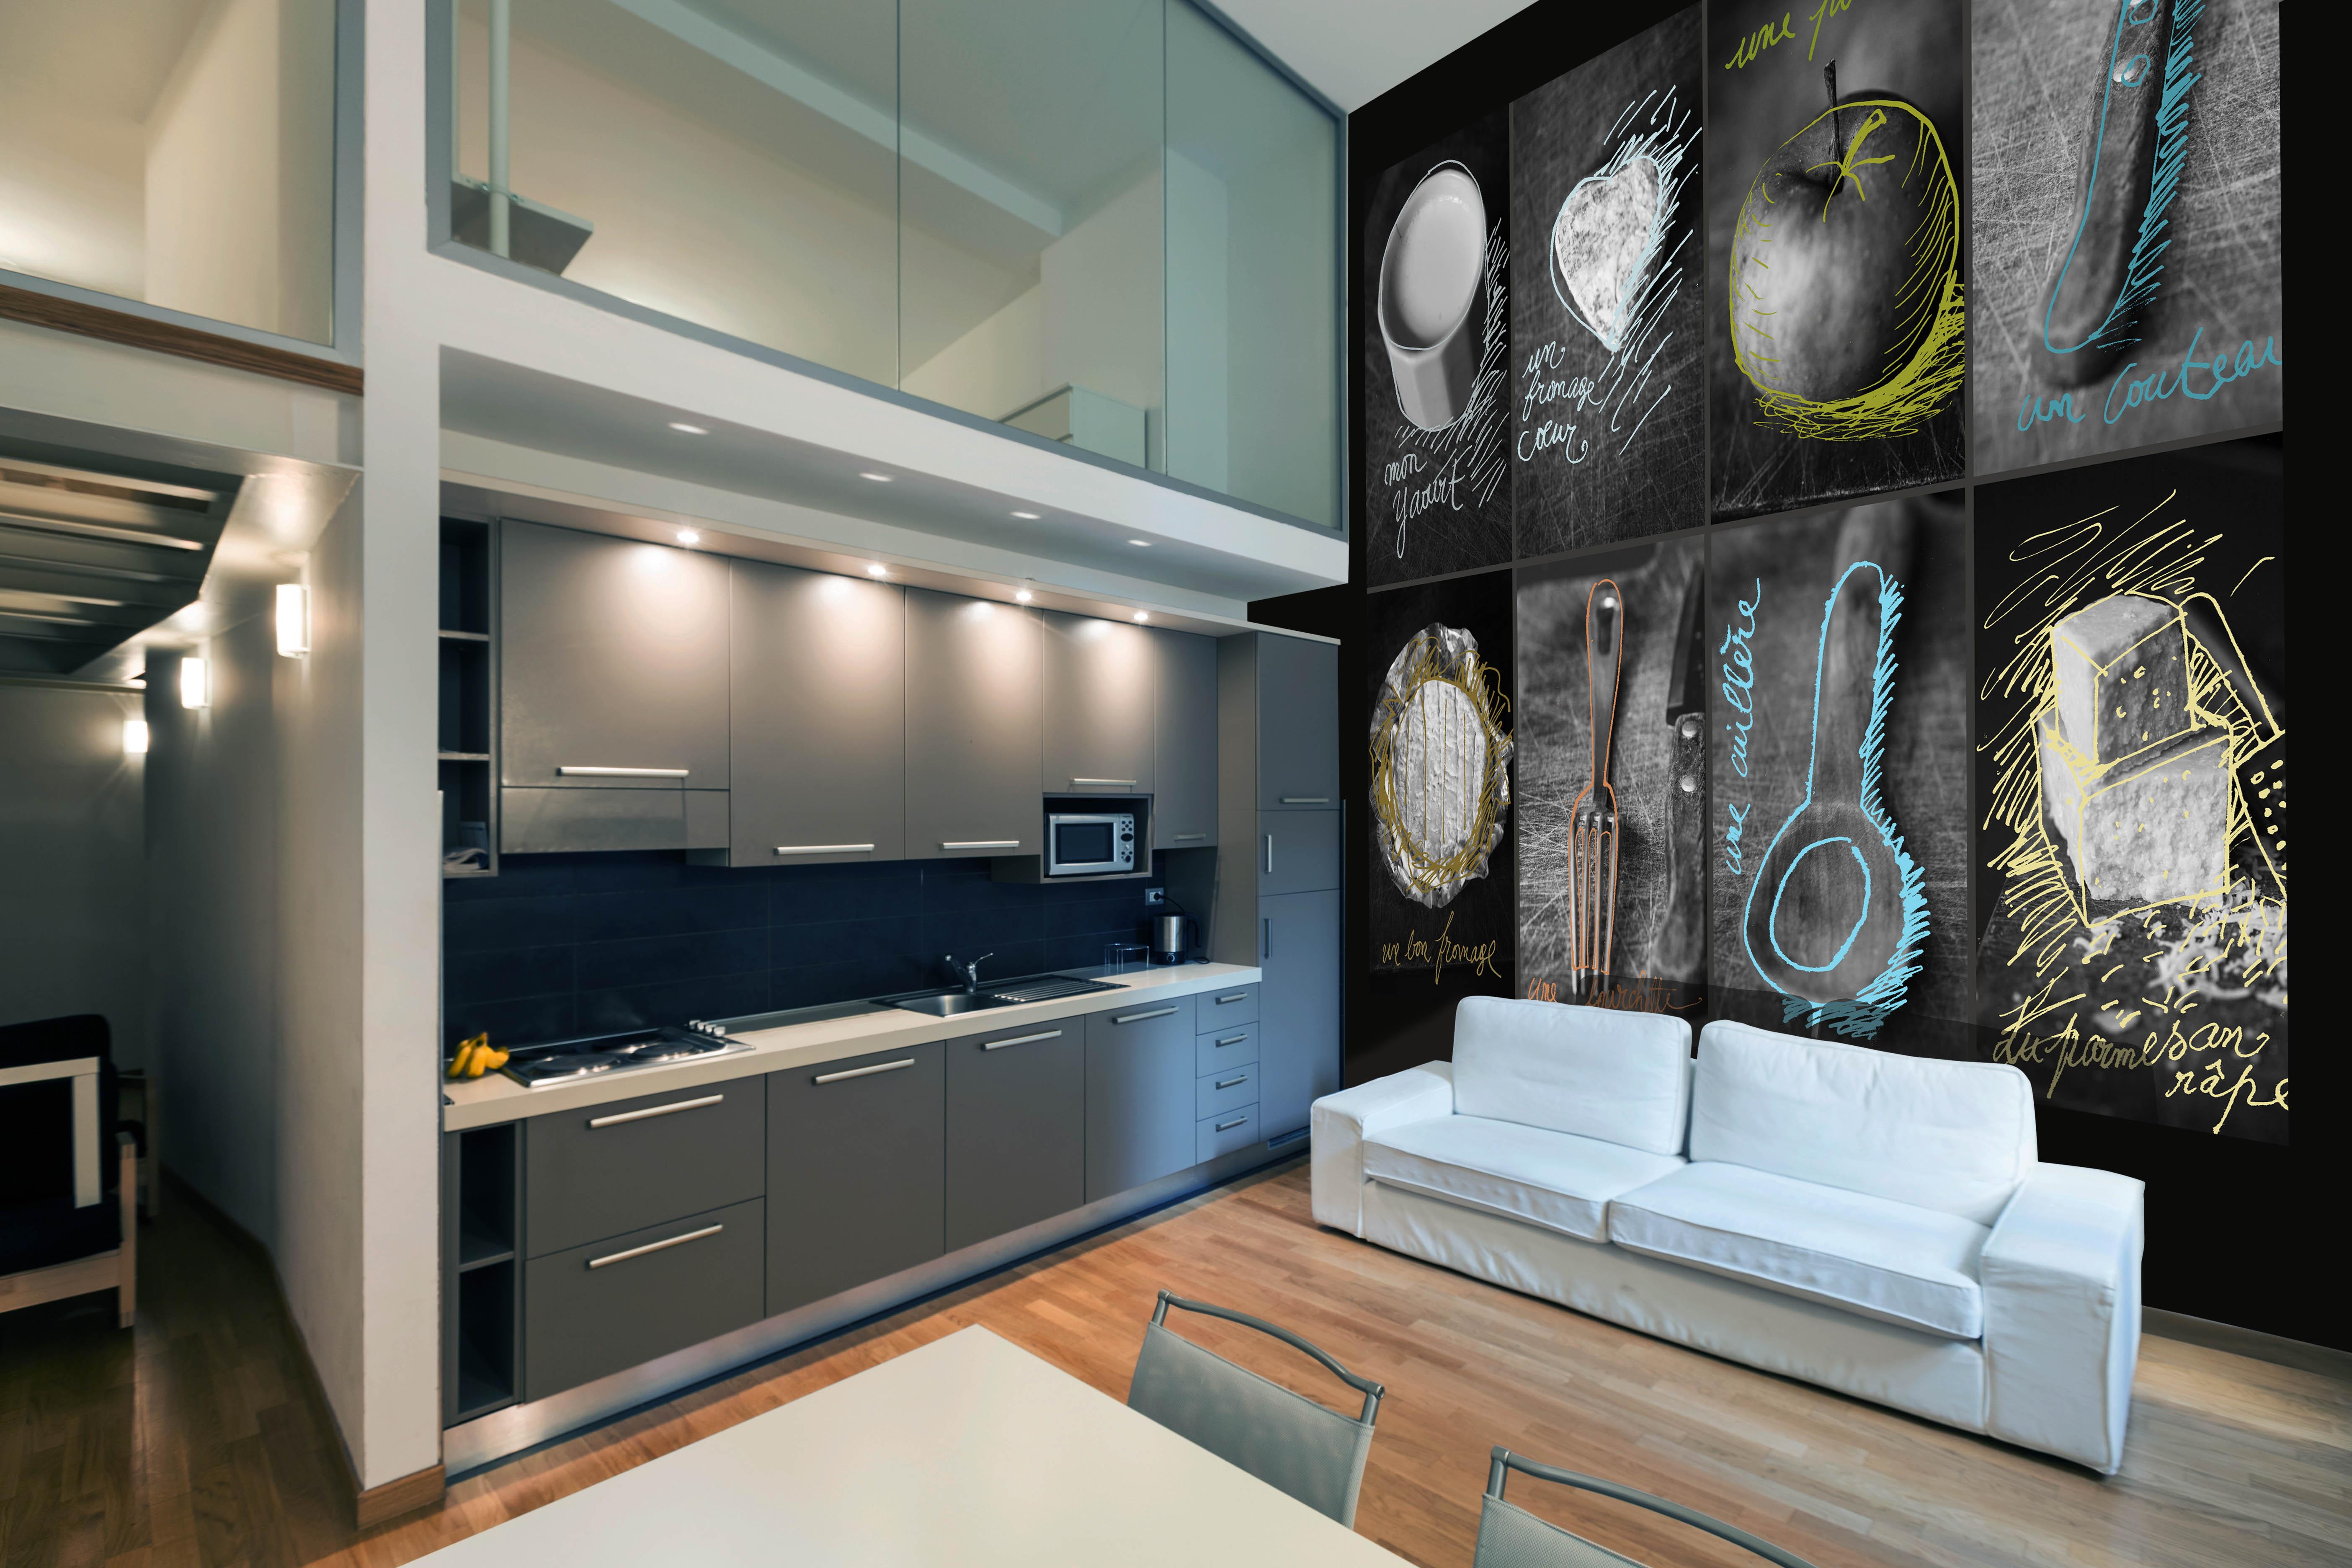 Fototapet Kitchen D195  Personalizat  Increation